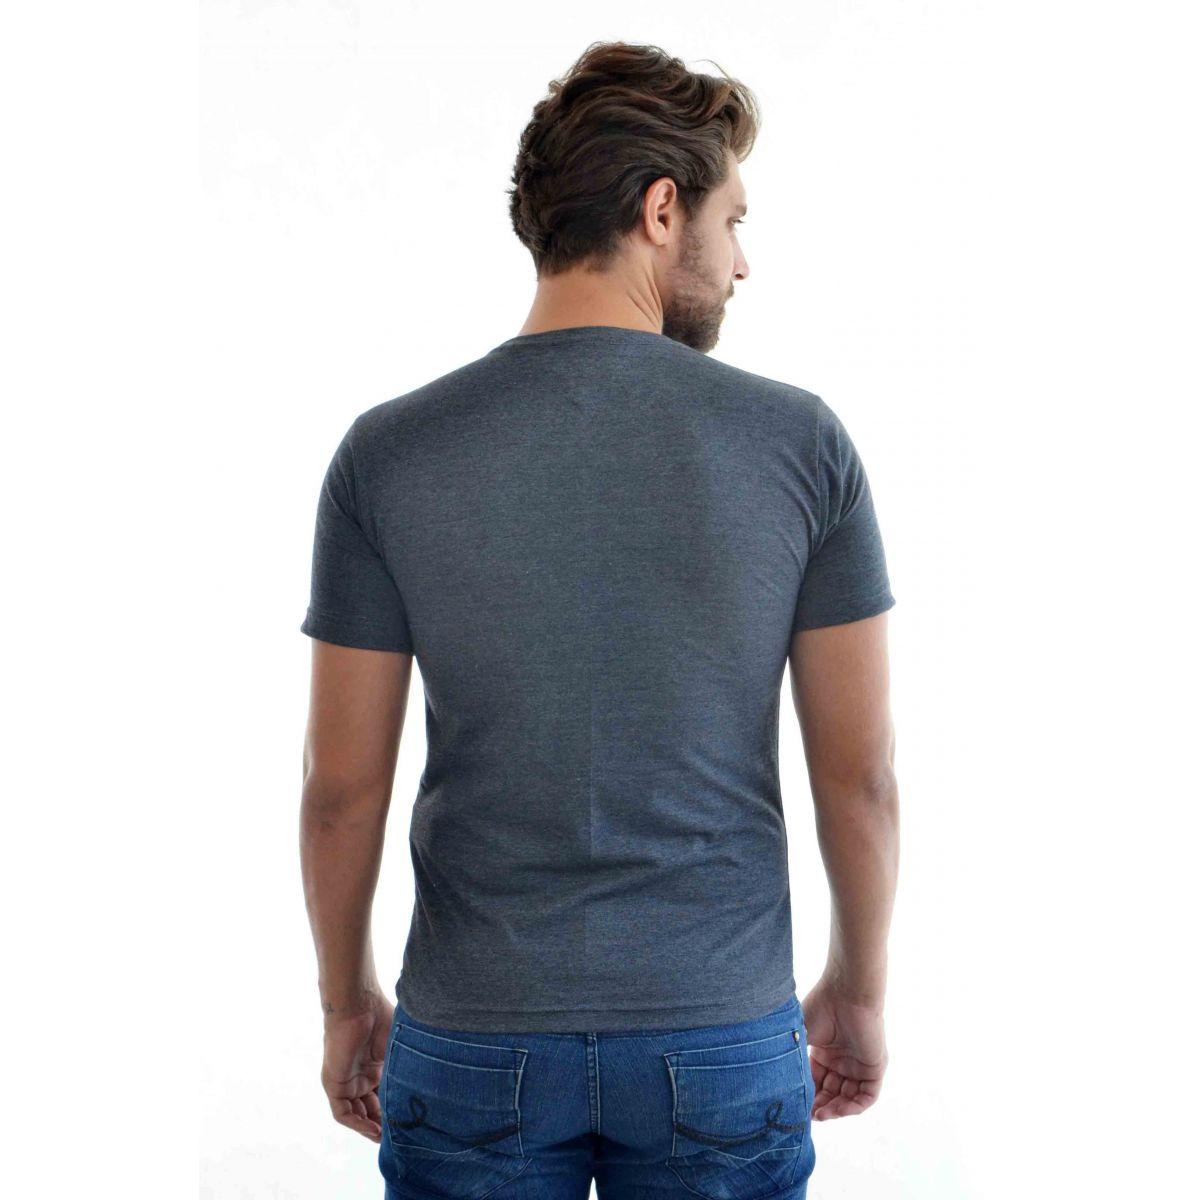 Camiseta Basic TH Mescla Escuro  - Ca Brasileira